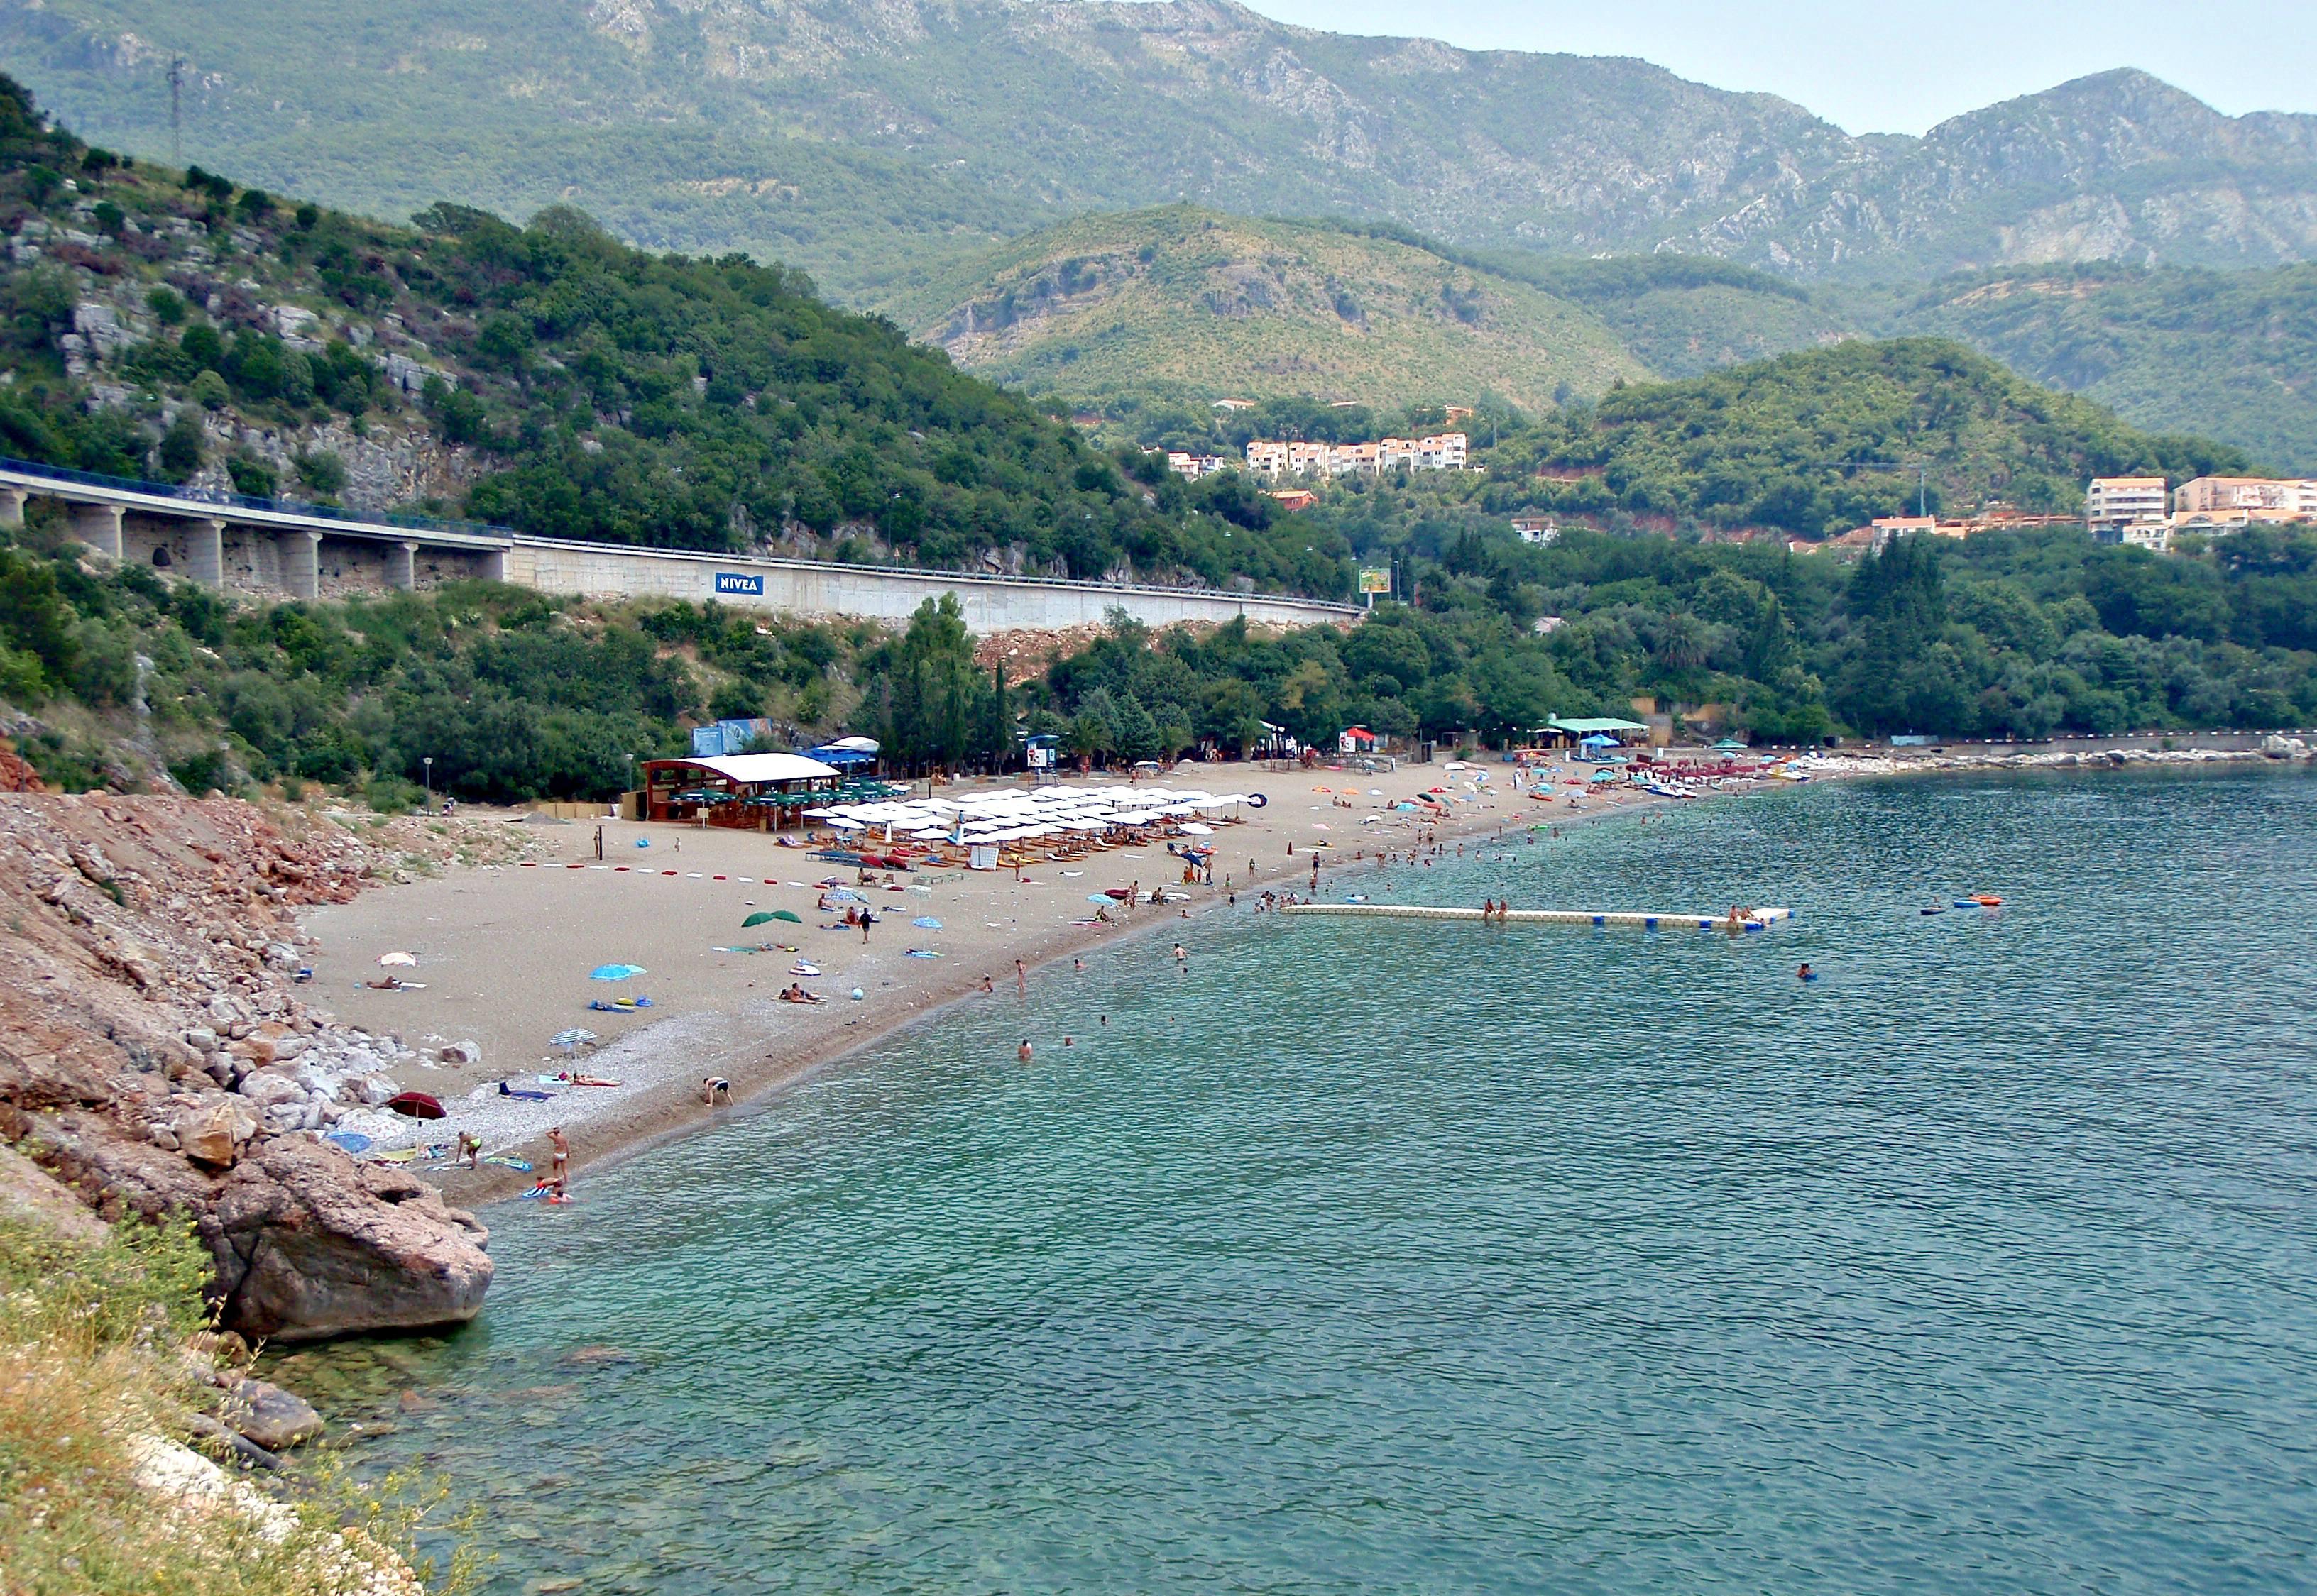 BADE: Kamenovo-stranden er en av flere populære samlingssteder og sommerne. Foto: Jeljena Kojicic.